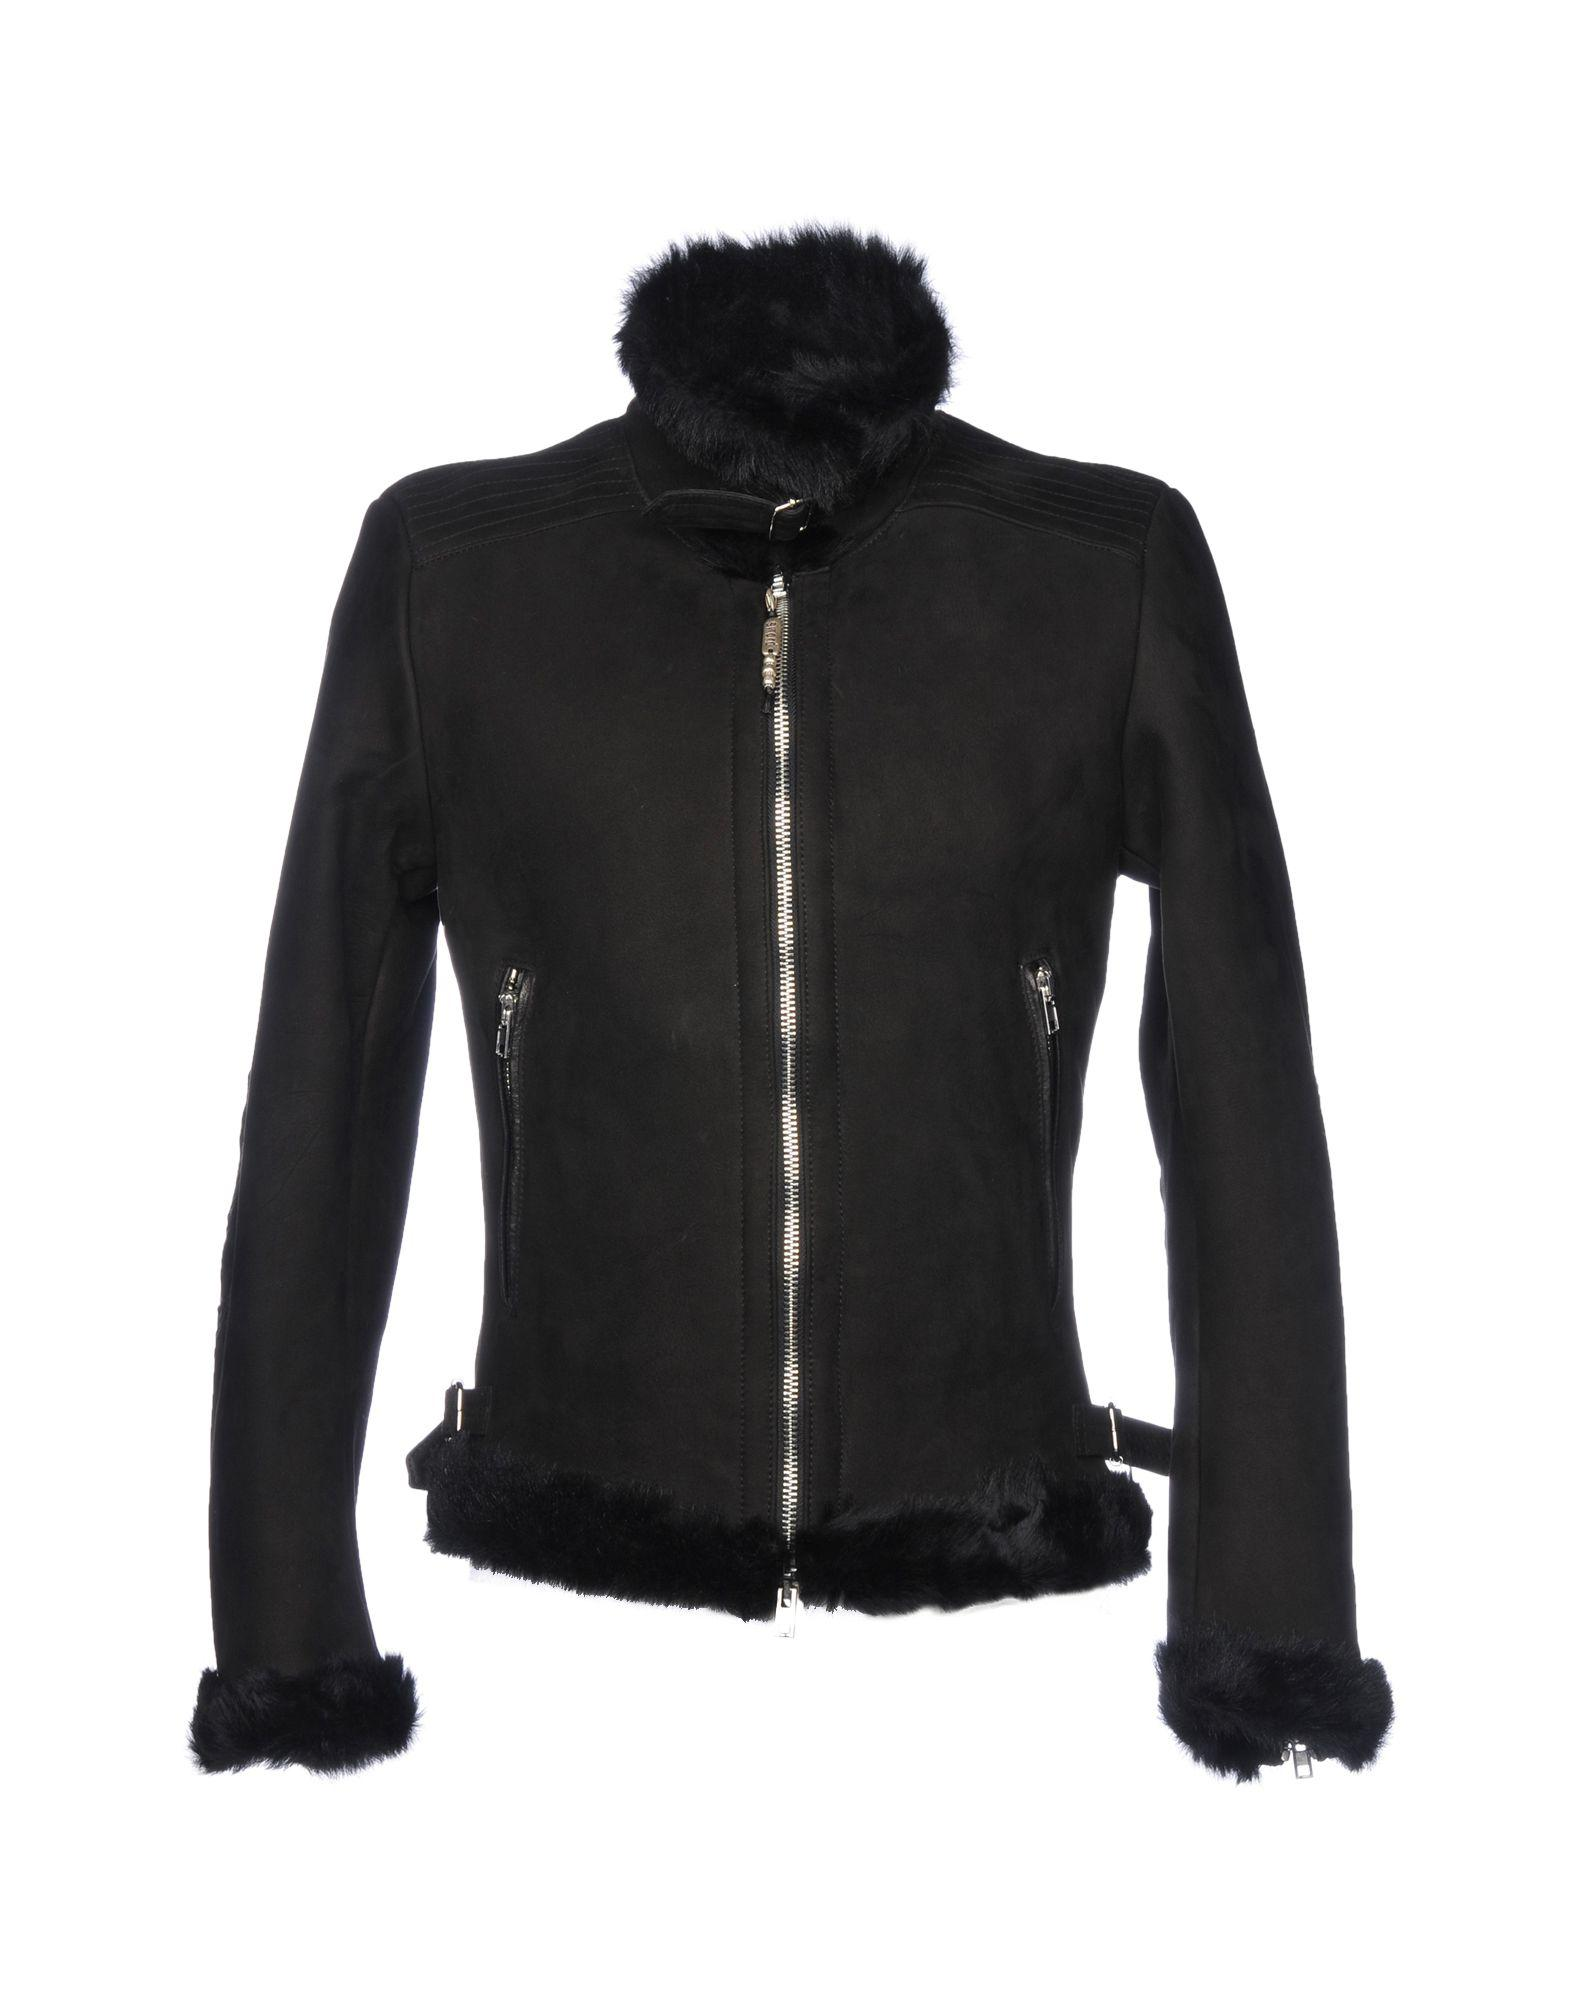 Sword 6.6.44 Leather Jacket In Black